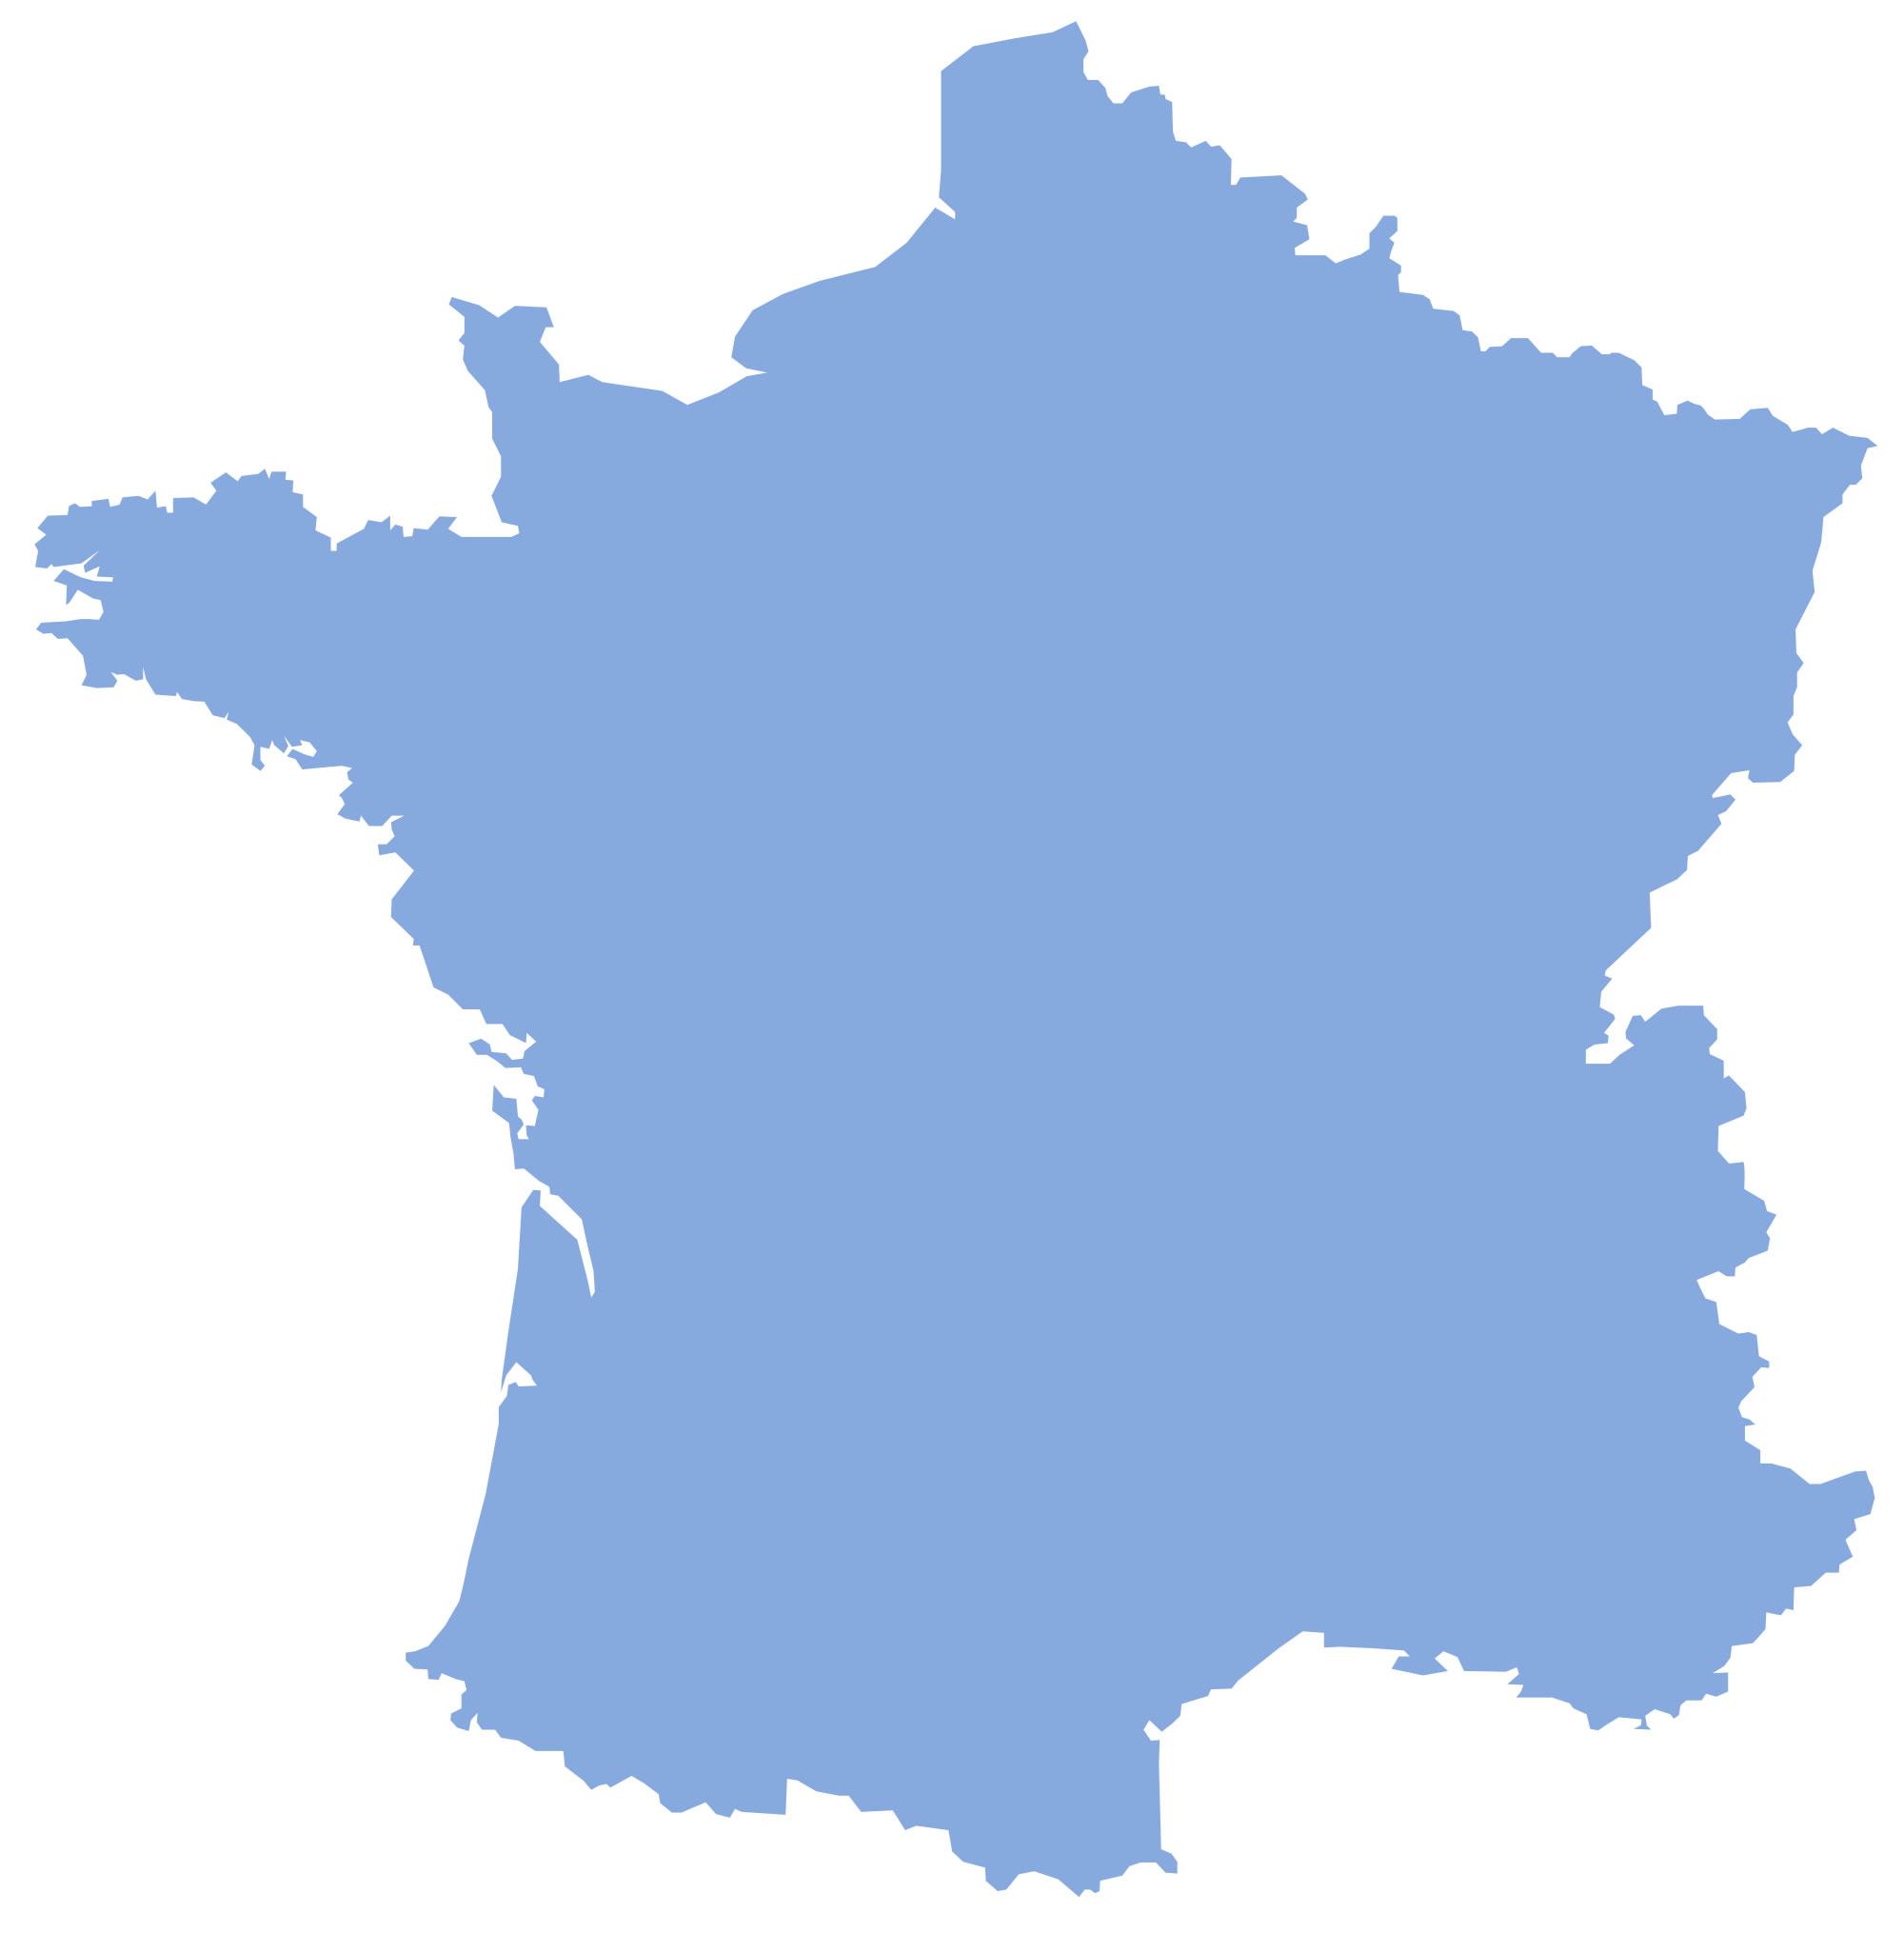 Carte De France Vierge Bleue, Carte Vierge Bleue De France dedans Carte Vierge De La France